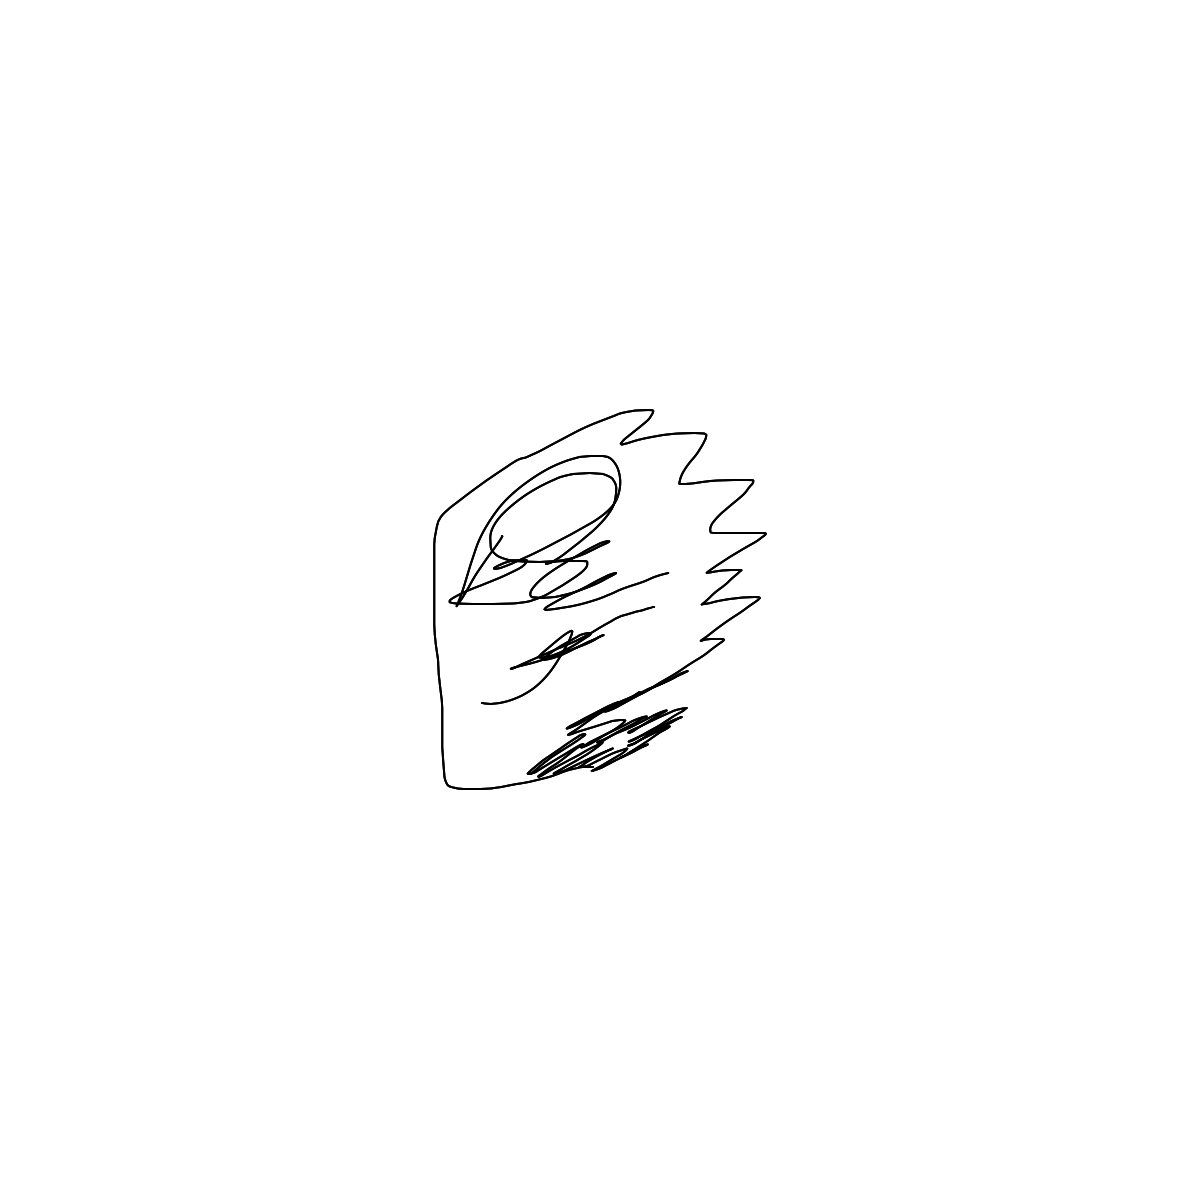 BAAAM drawing#1115 lat:52.2454605102539060lng: 13.3222961425781250